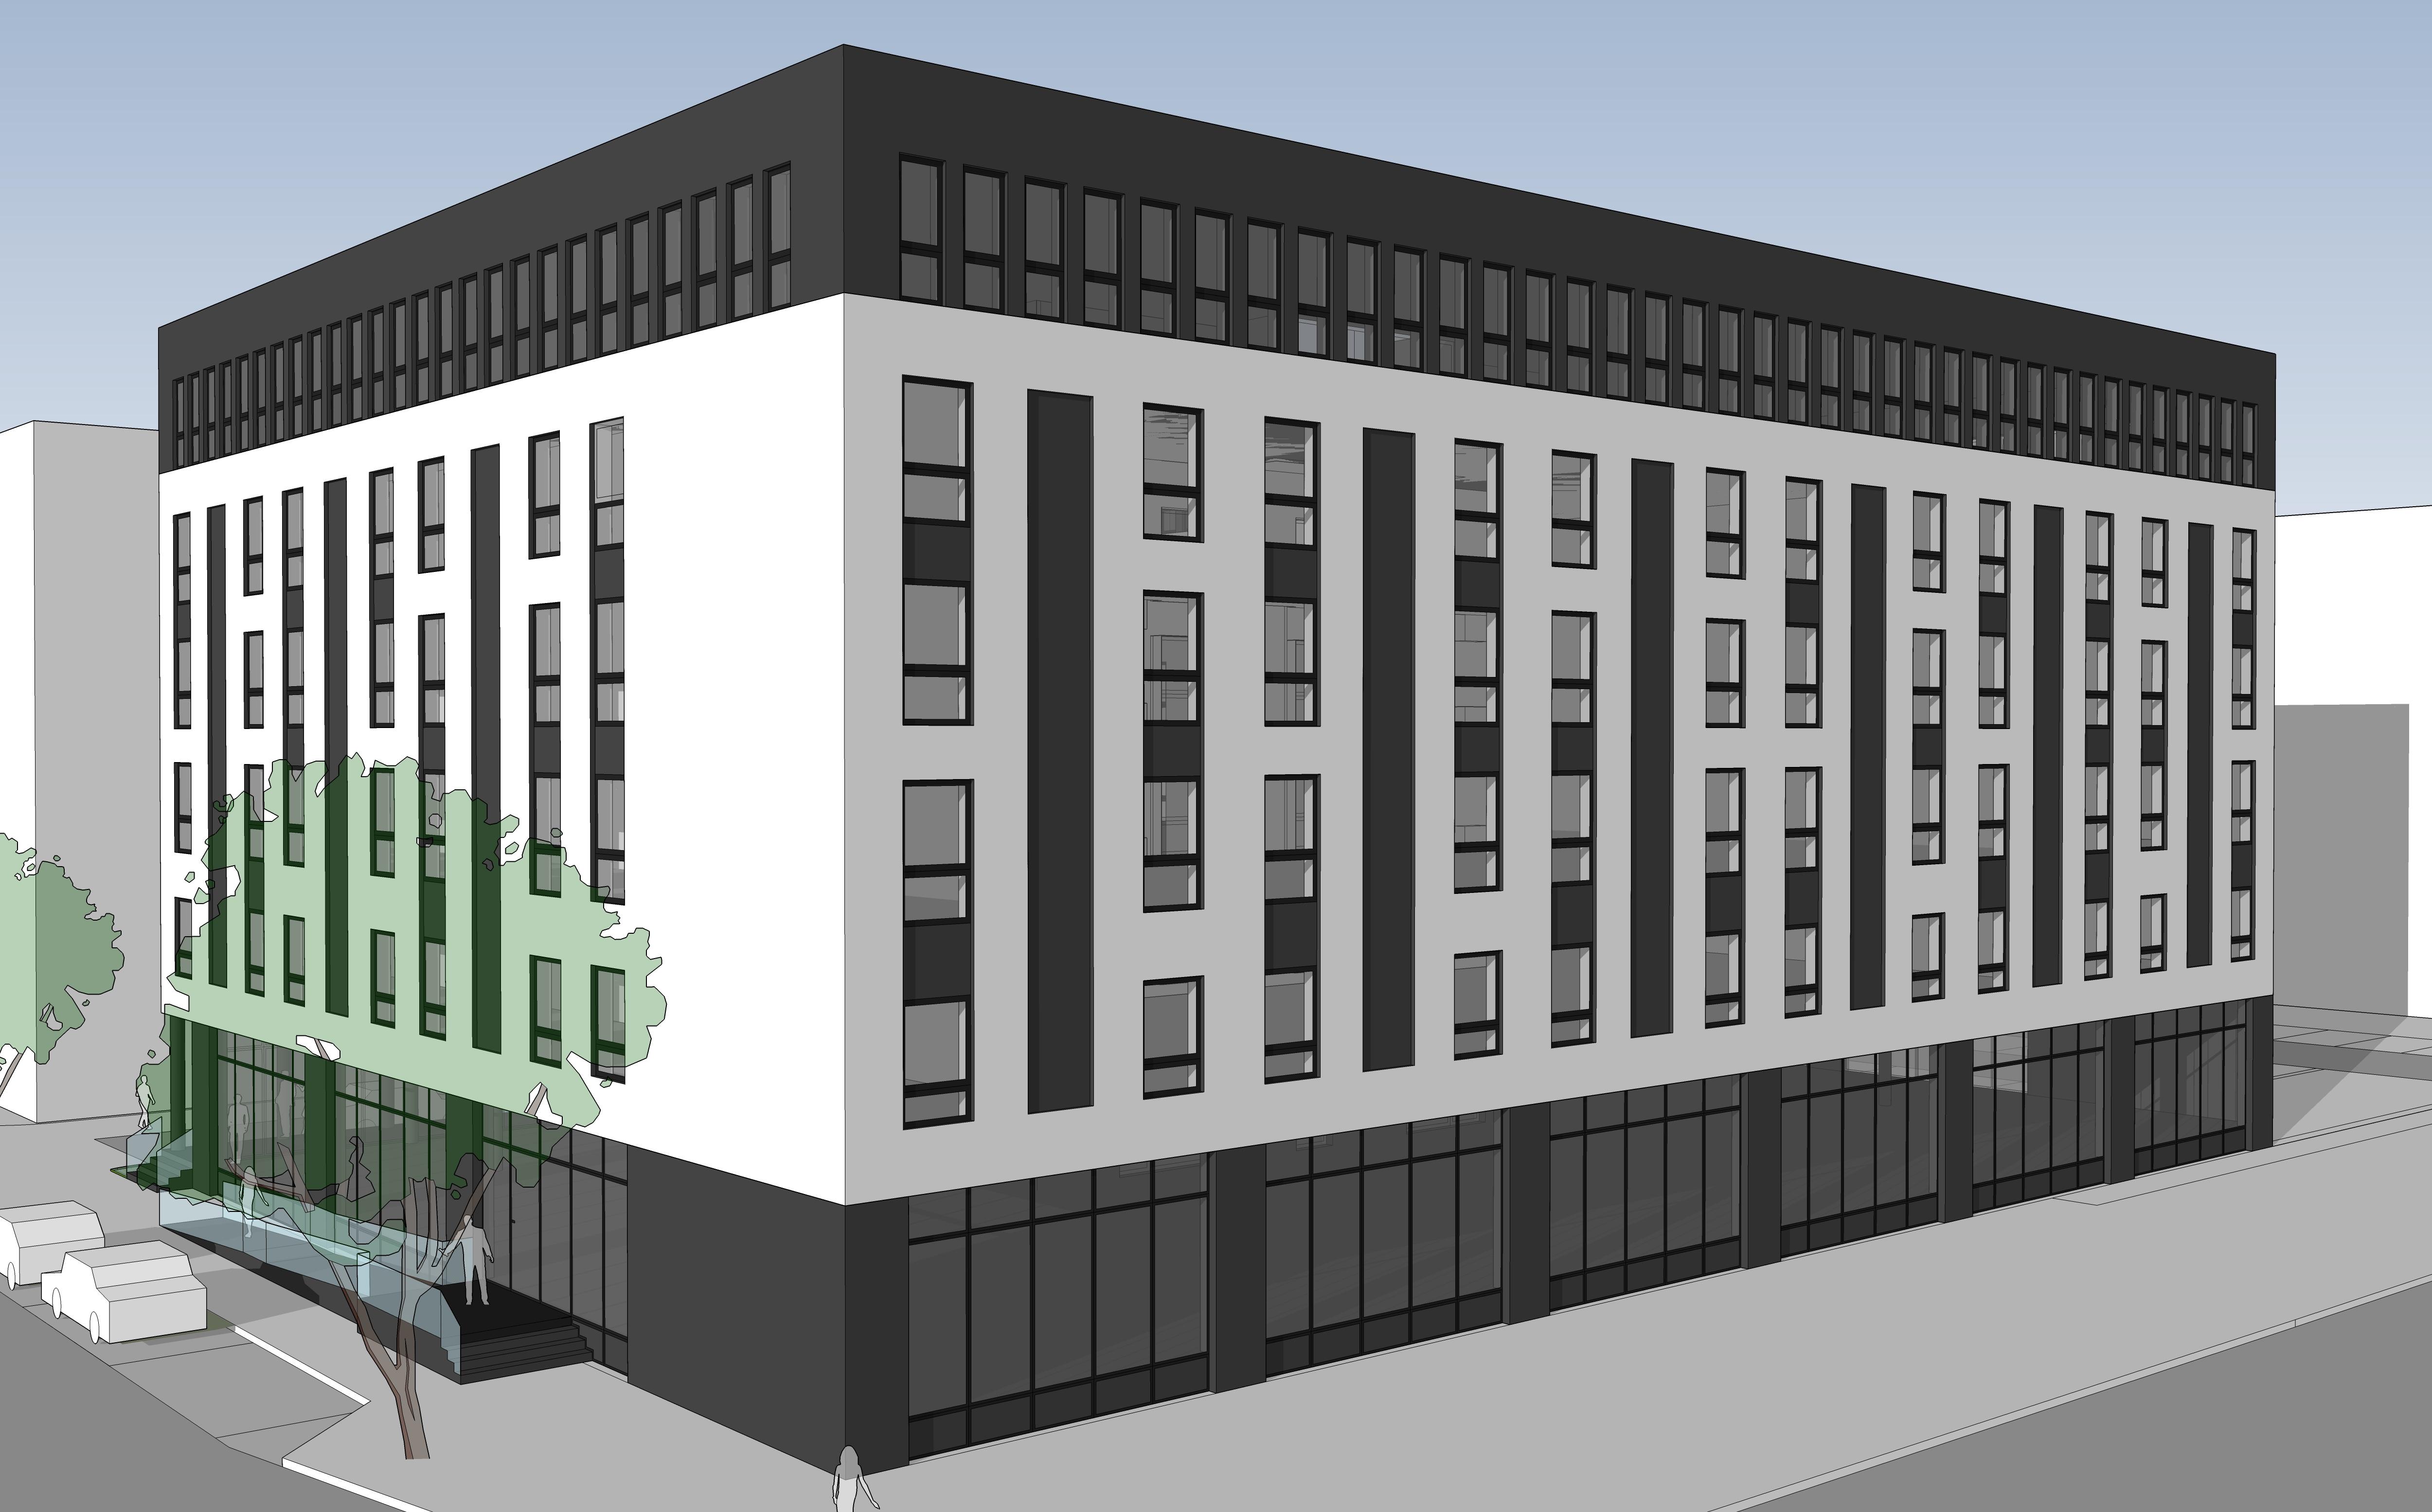 neubau boardinghouse bielefeld stopfel architekten bda. Black Bedroom Furniture Sets. Home Design Ideas